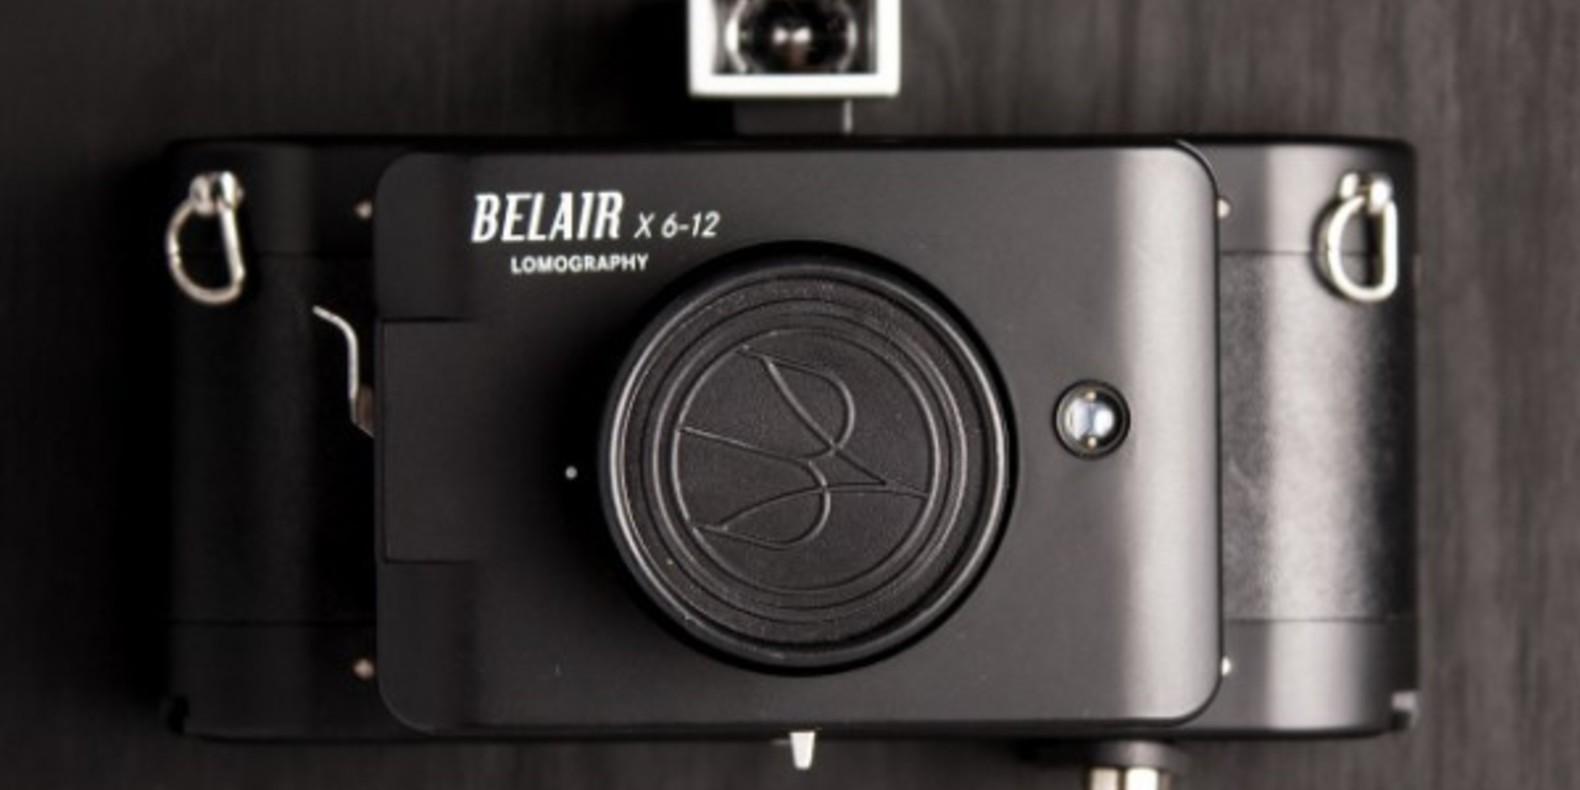 Hangie laudlab fichier 3D cults appareil photo camera 7